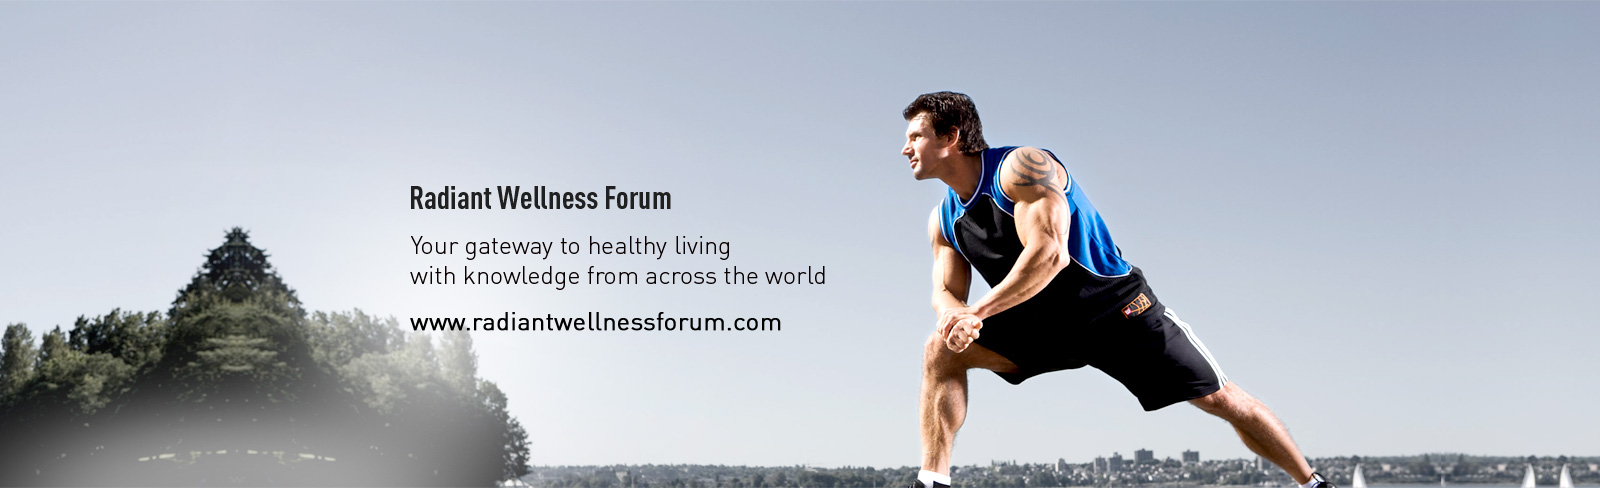 radiant-wellness-forum